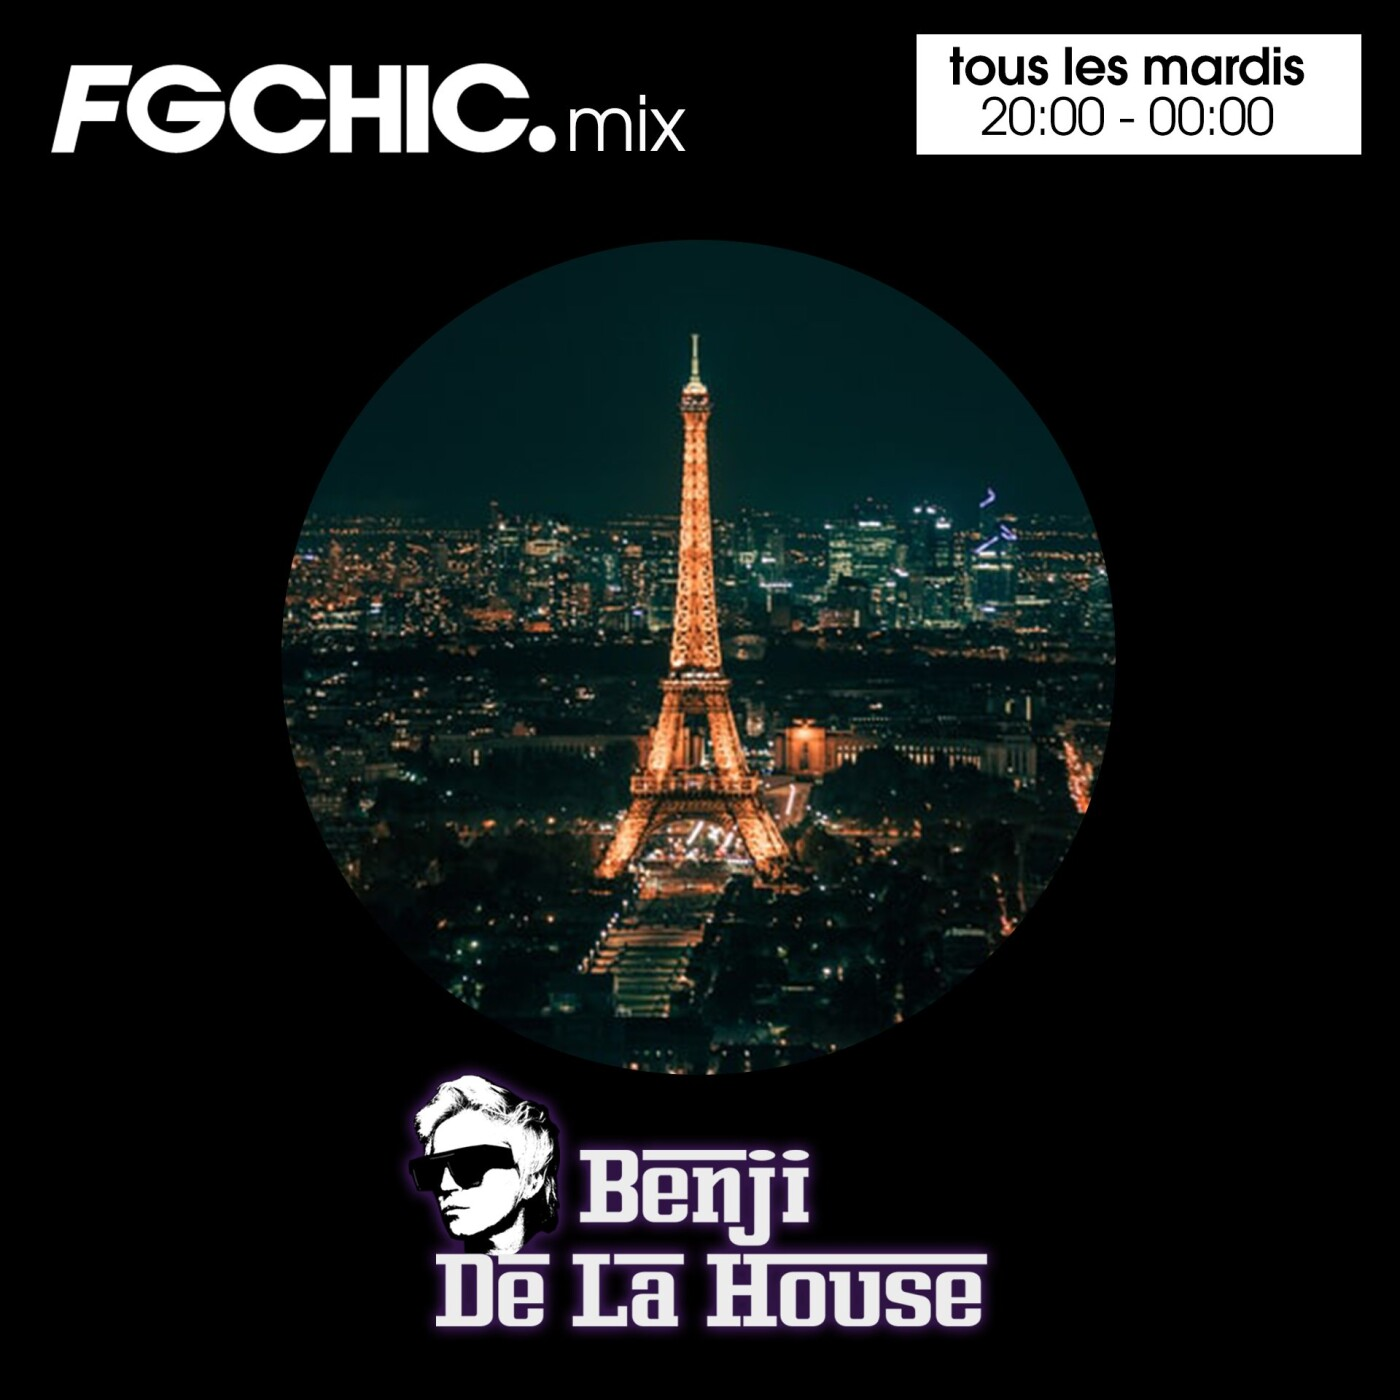 FG CHIC MIX BY BENJI DE LA HOUSE